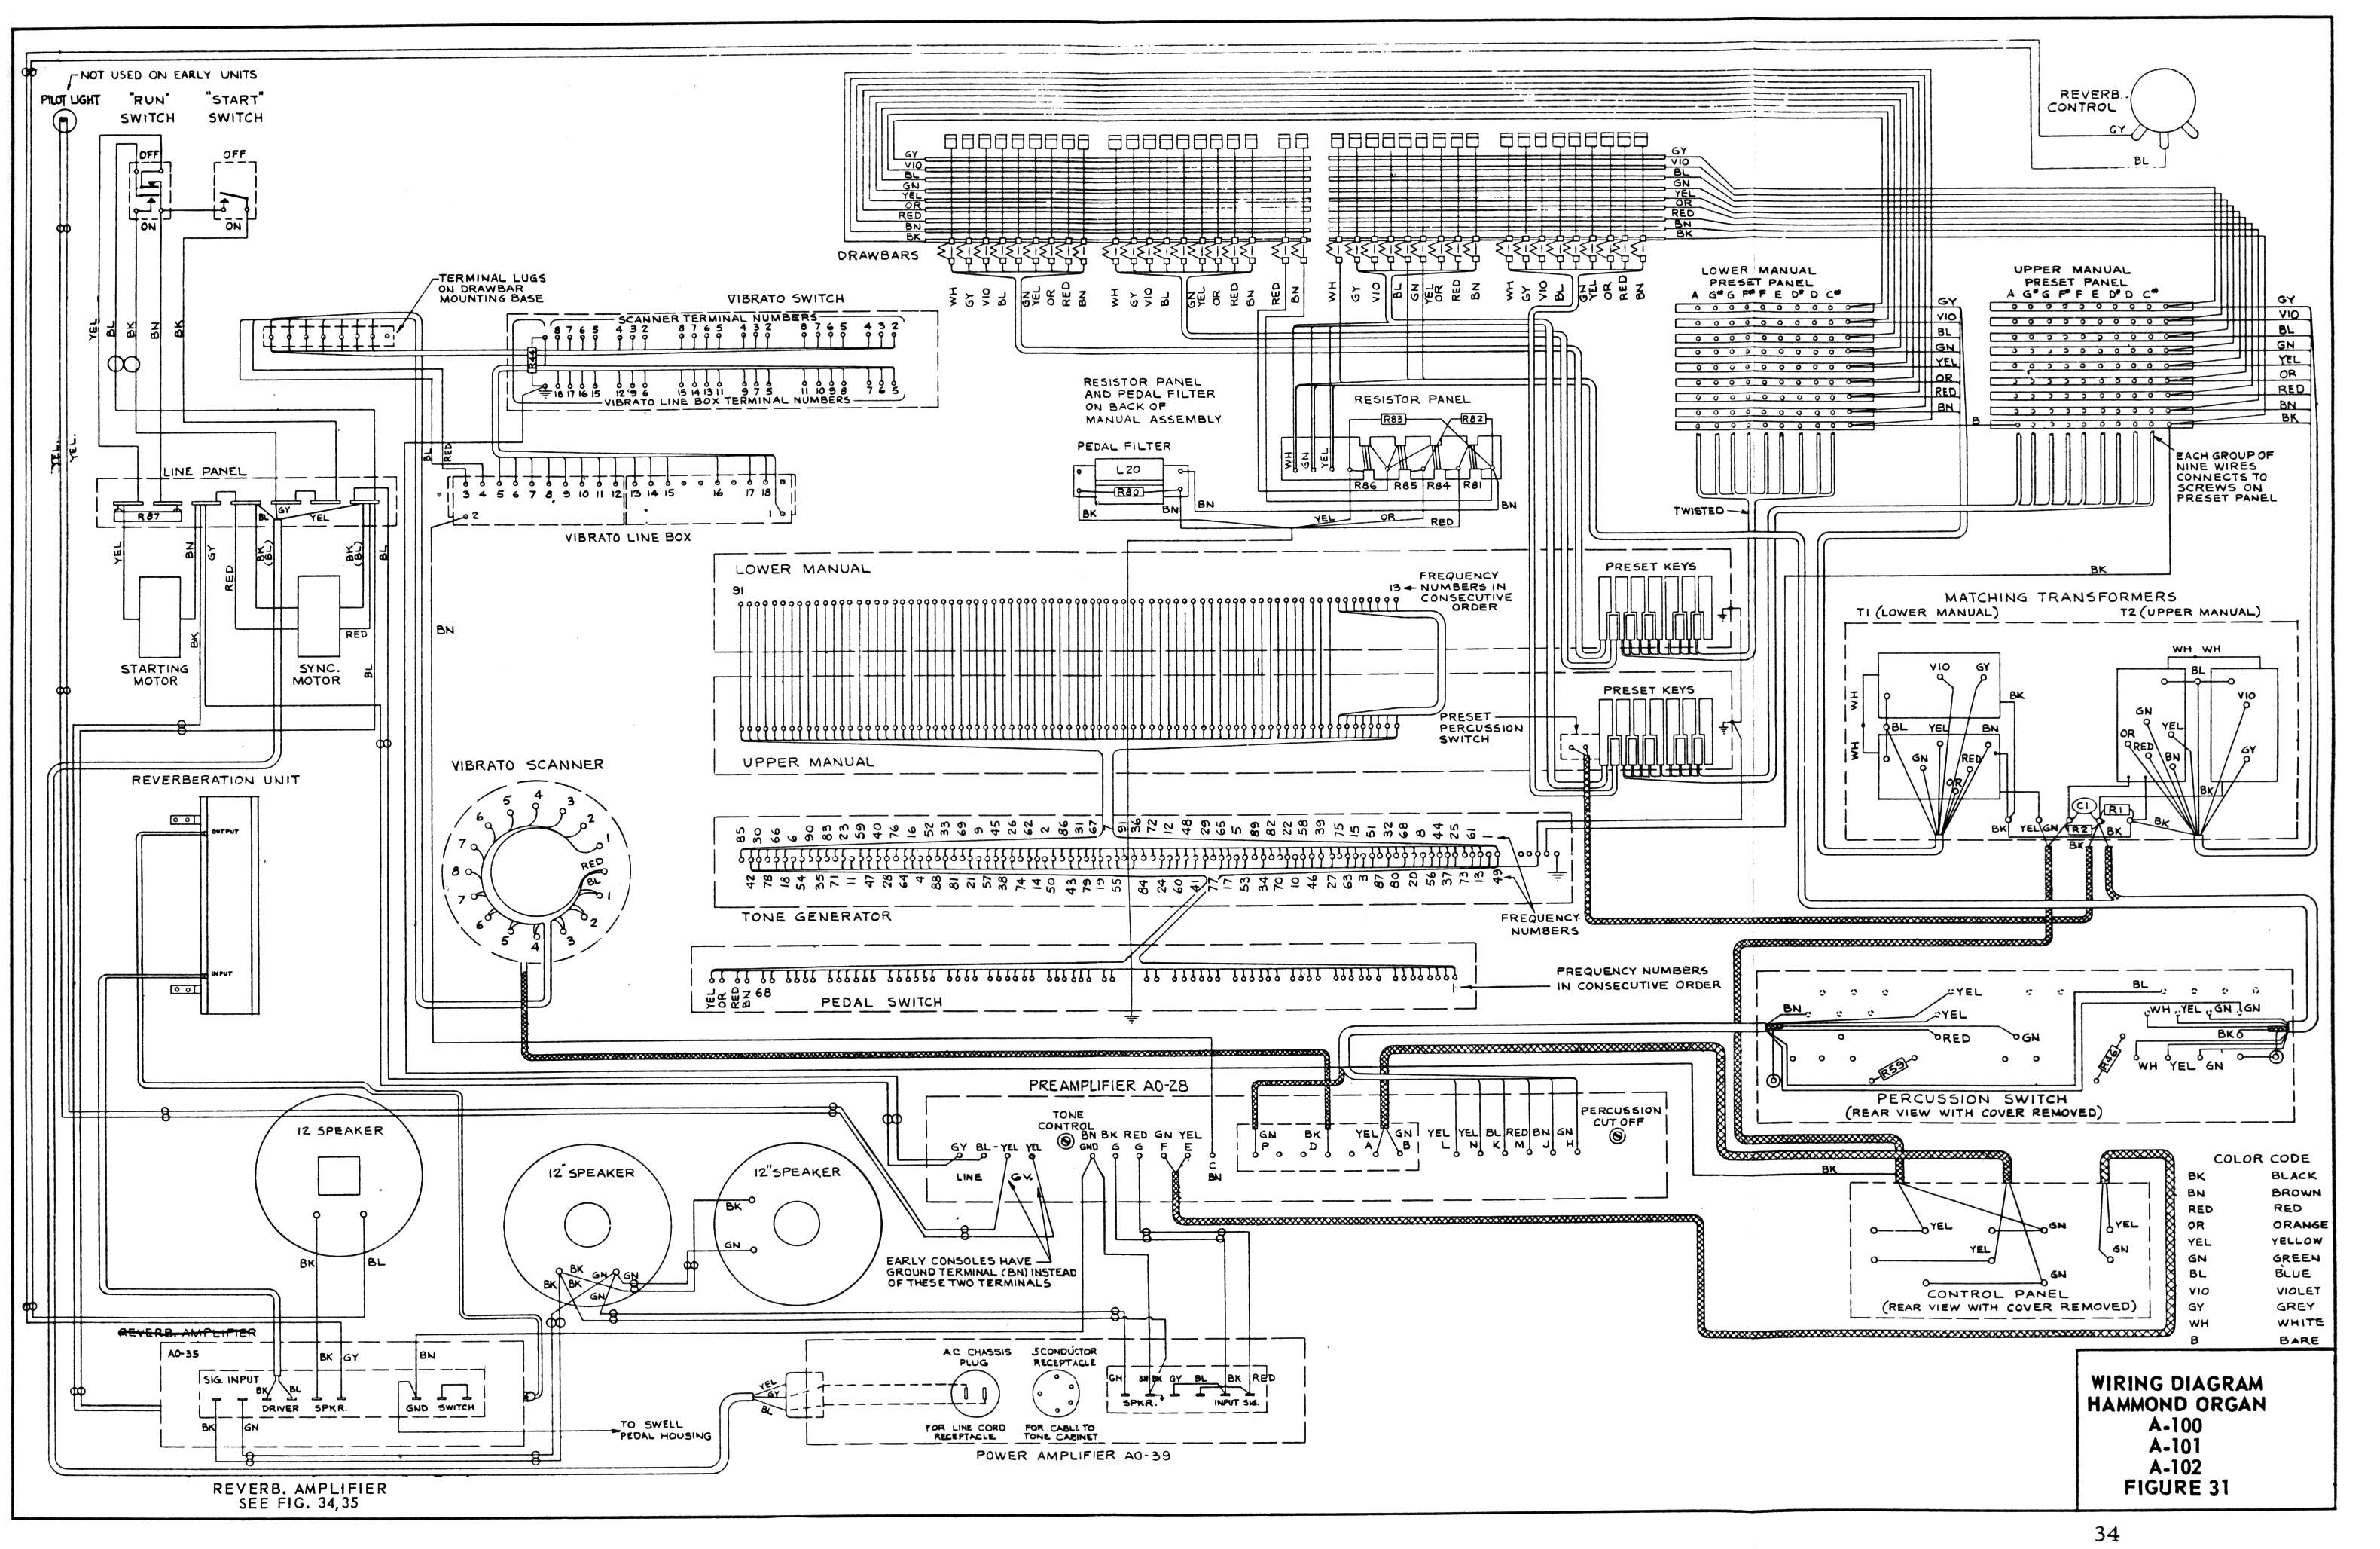 A-100 Service Manual